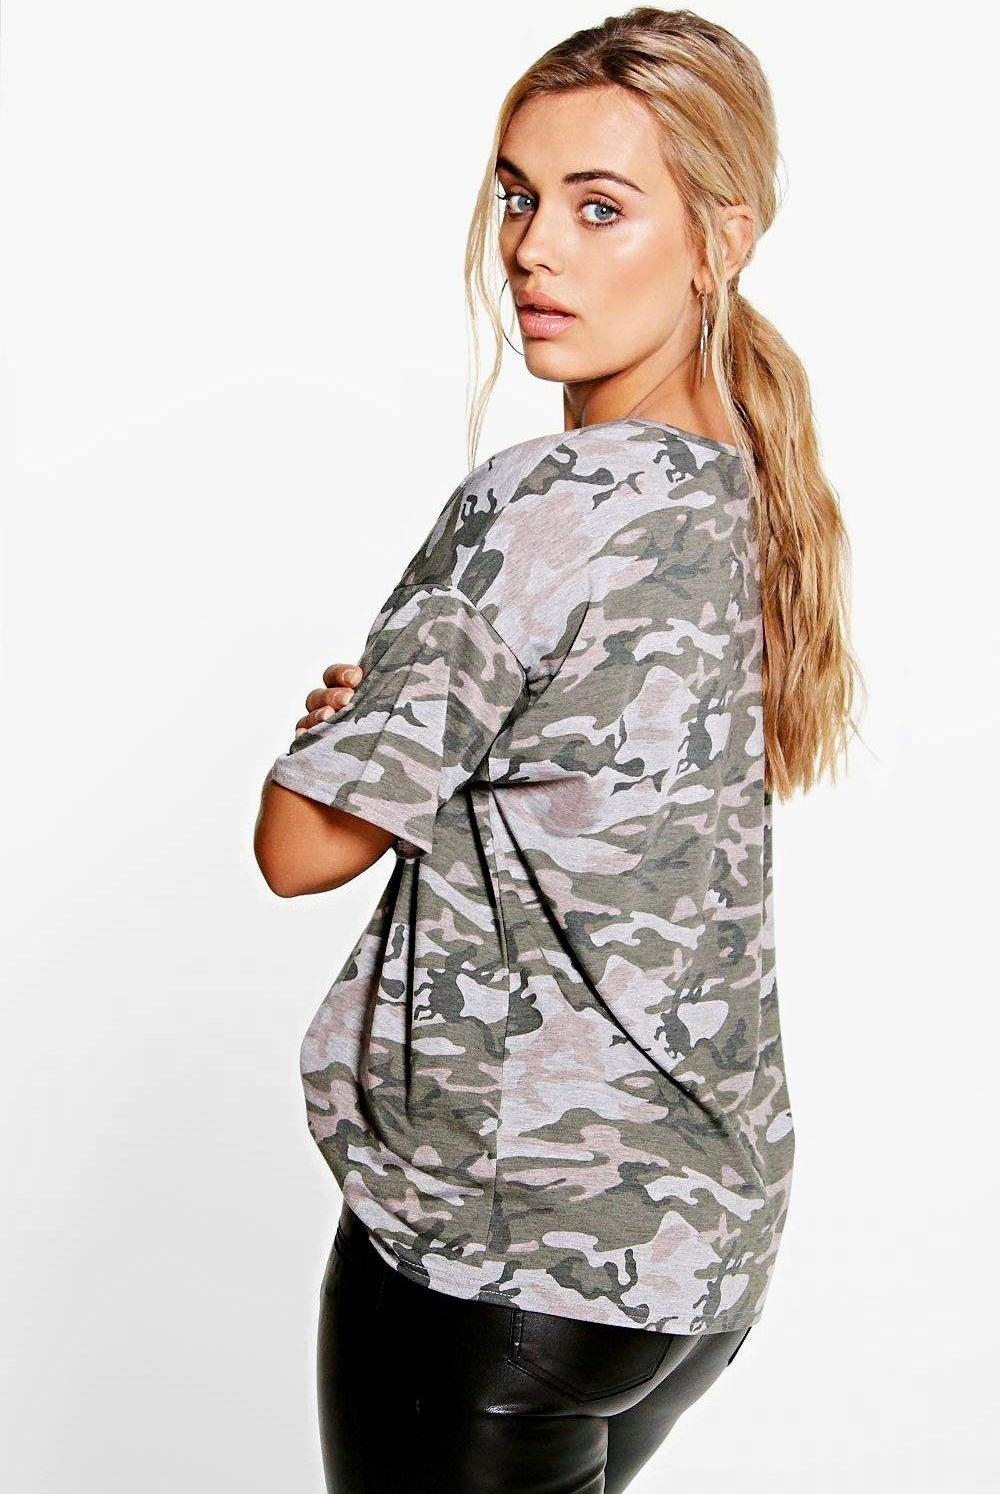 A model wearing the camo tee